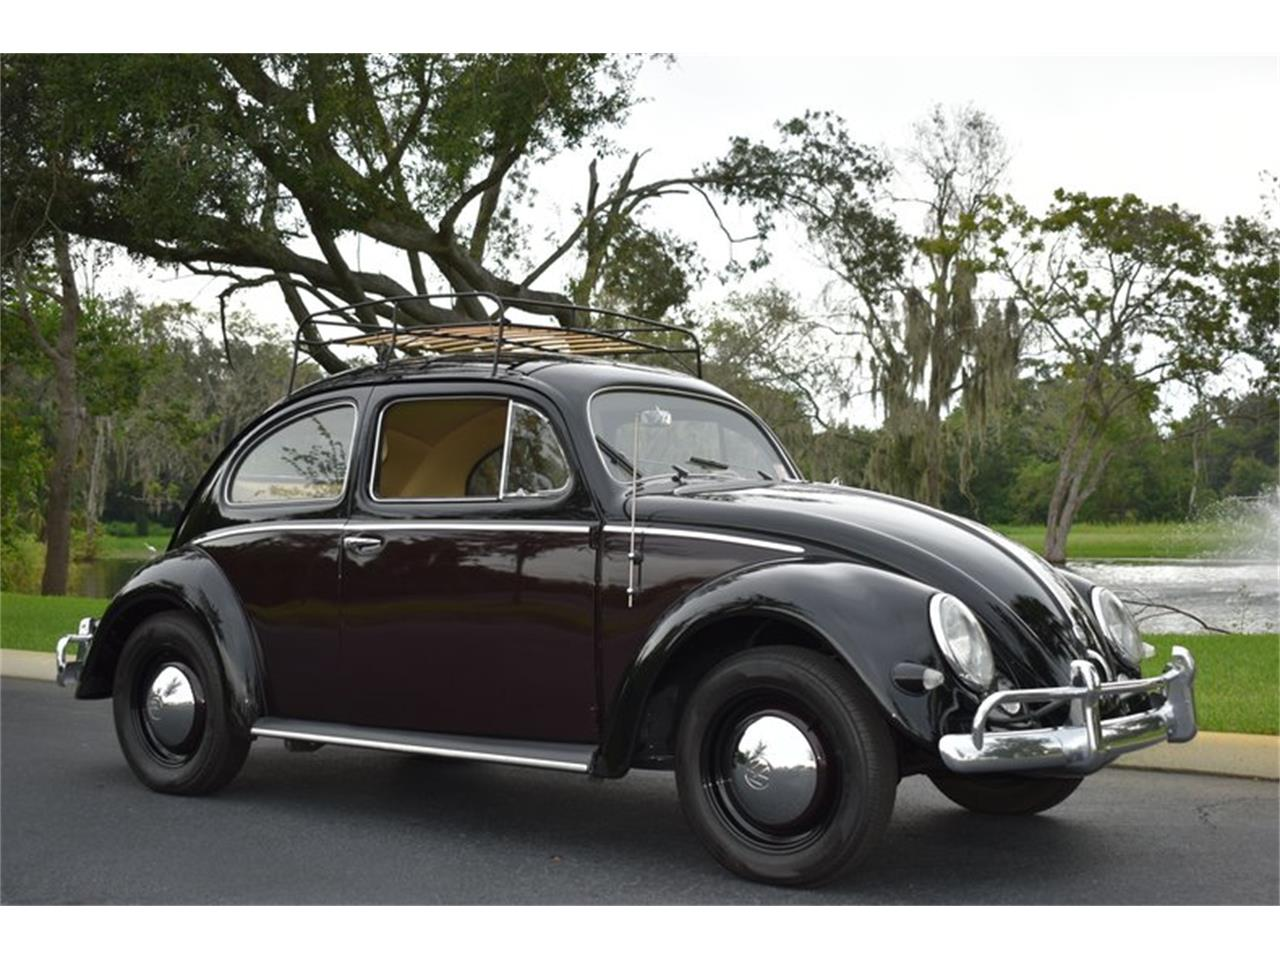 for sale 1956 volkswagen beetle in lakeland, florida cars - lakeland, fl at geebo